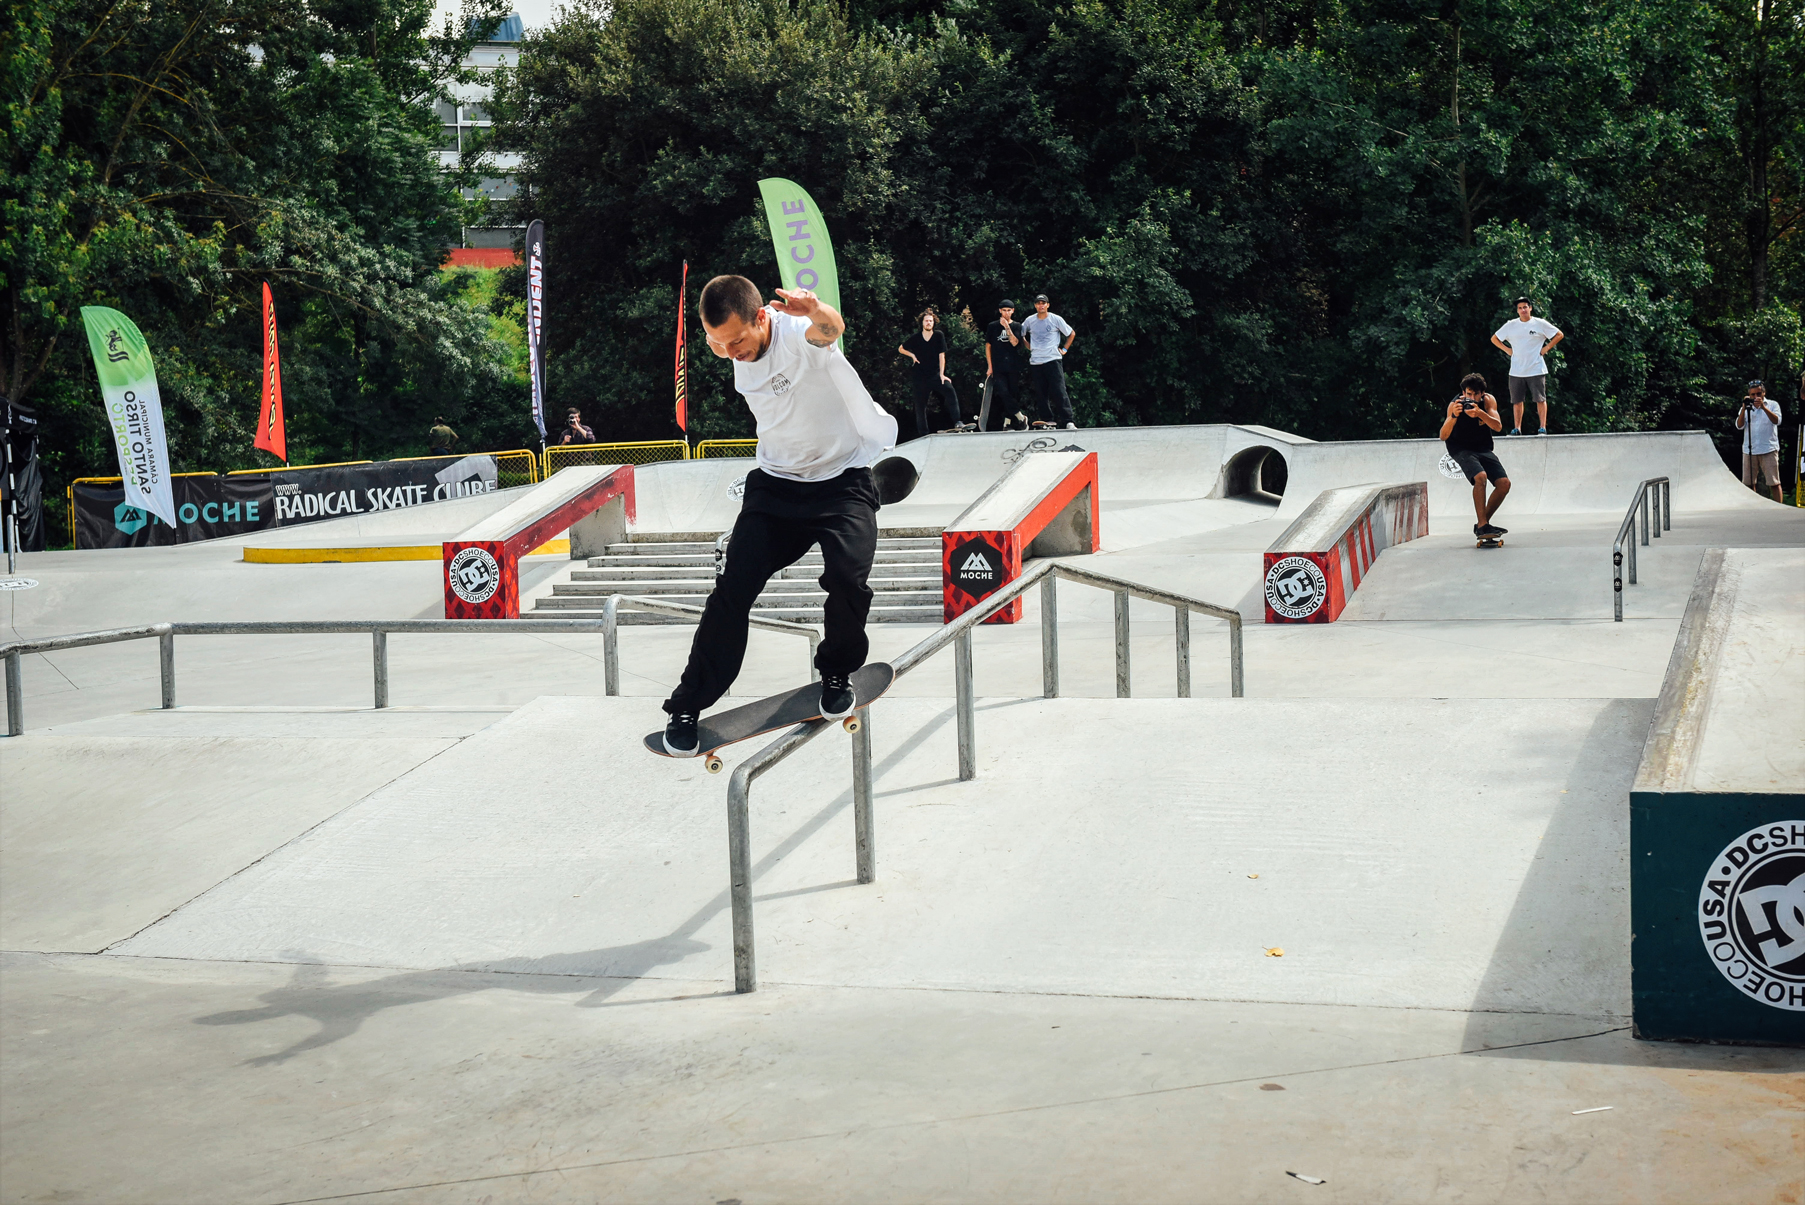 Jorge Simões Vence DC Skate Challenge By Moche